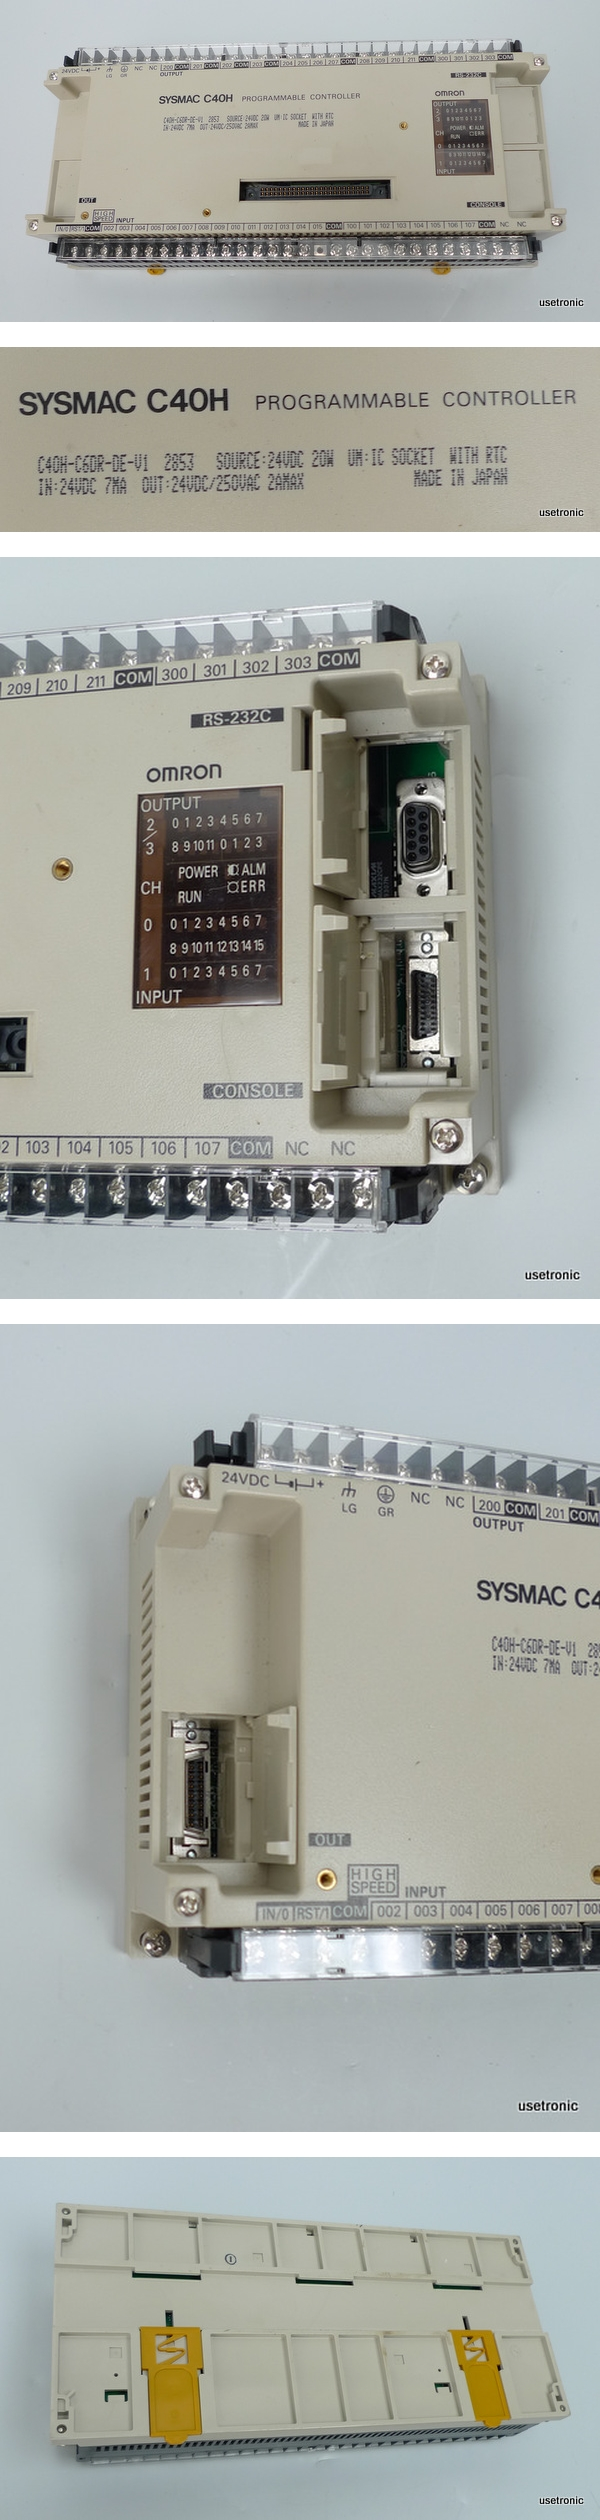 Omron Sysmac C40H-C6DR-DE-V1